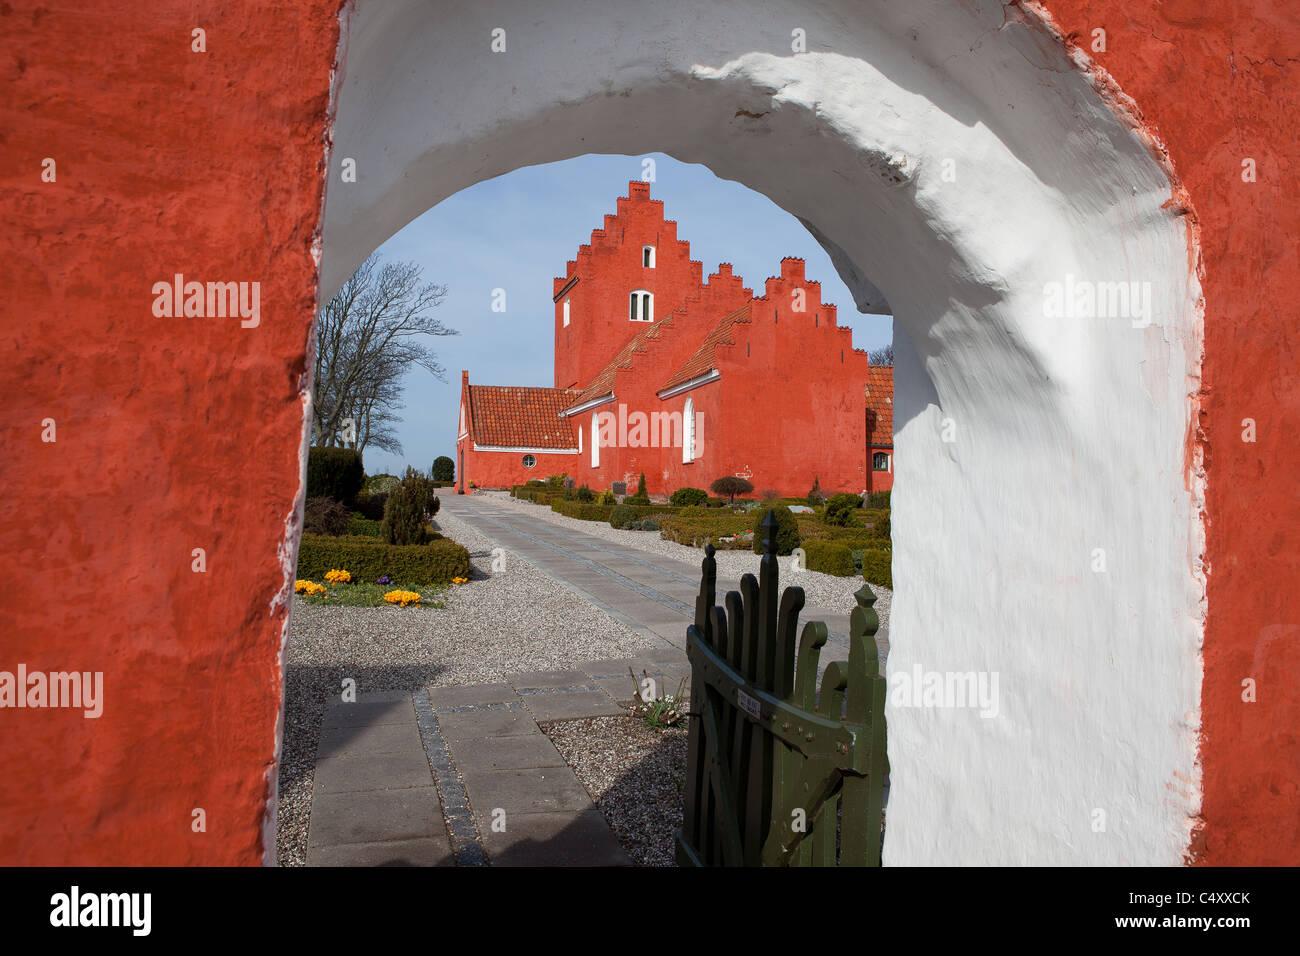 Odden Church - Stock Image